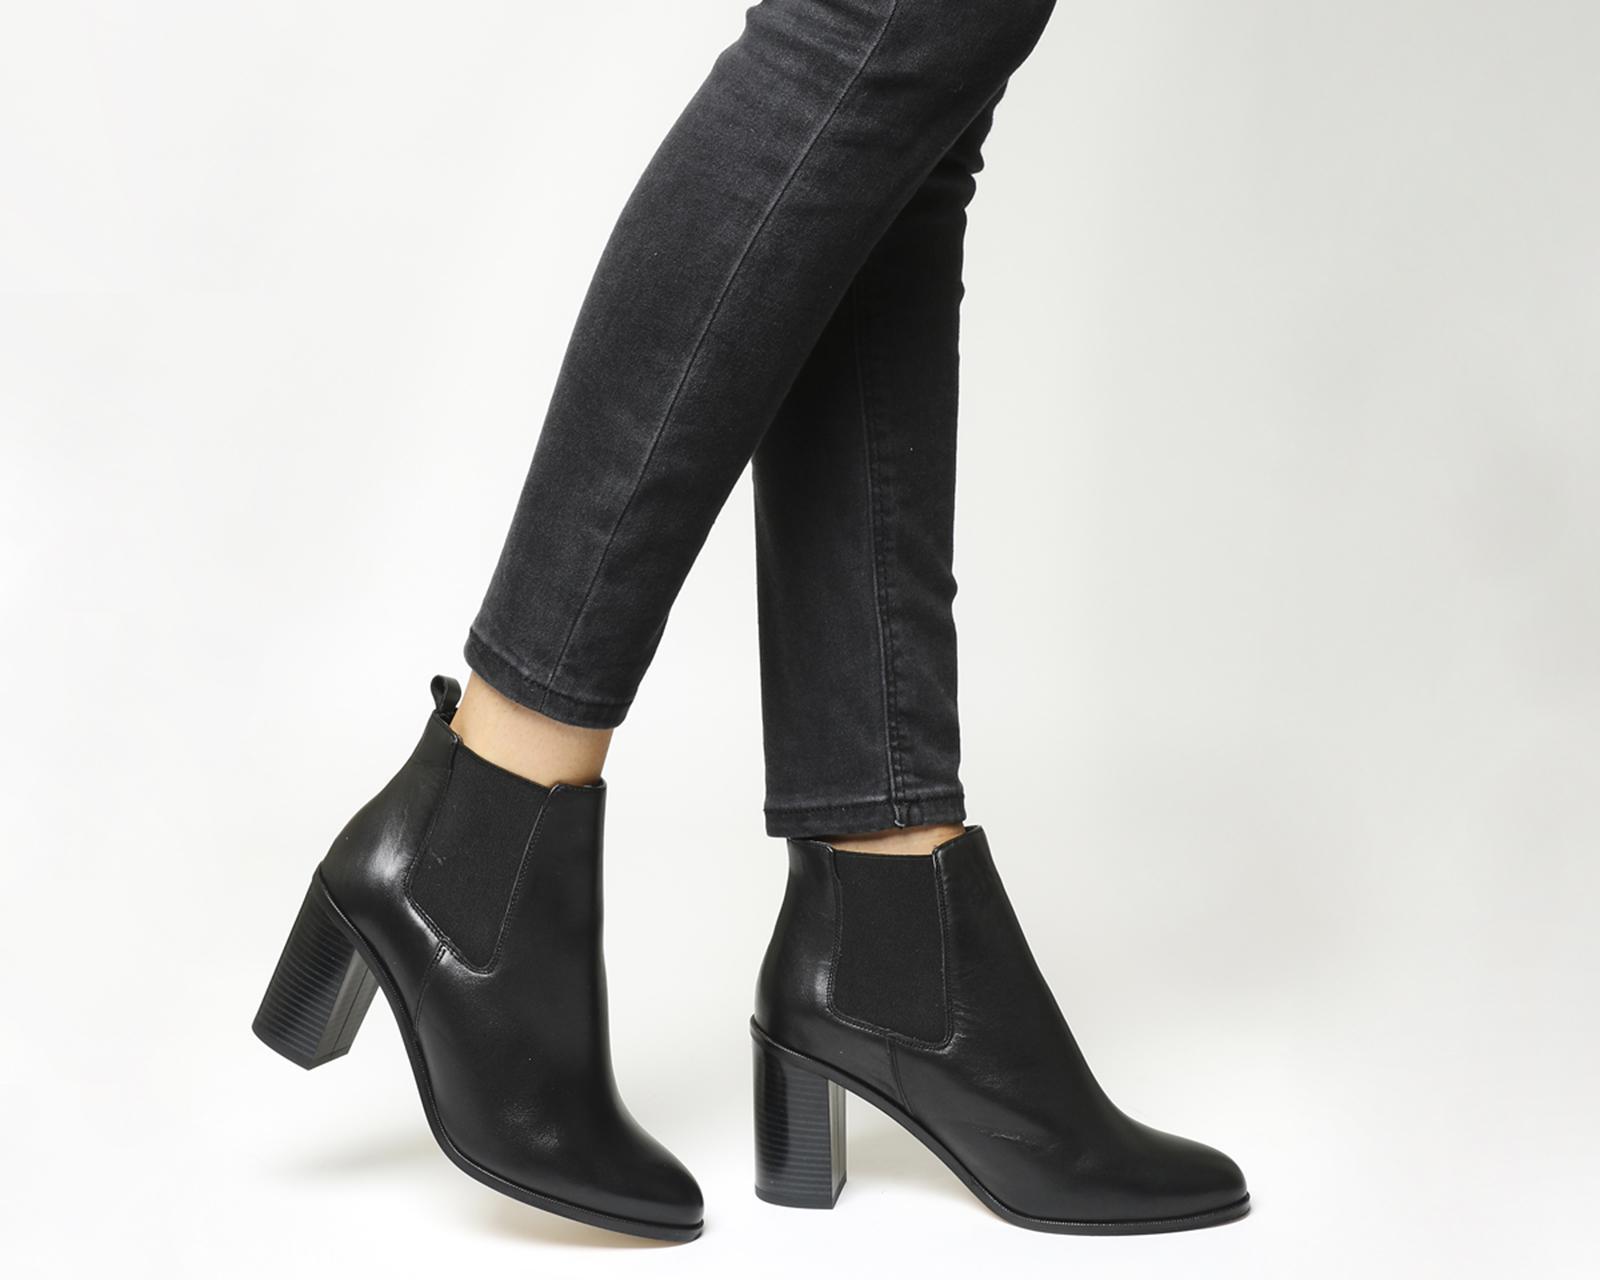 bf13f26abf4 Office - Black Logo Block Heel Chelsea Boots - Lyst